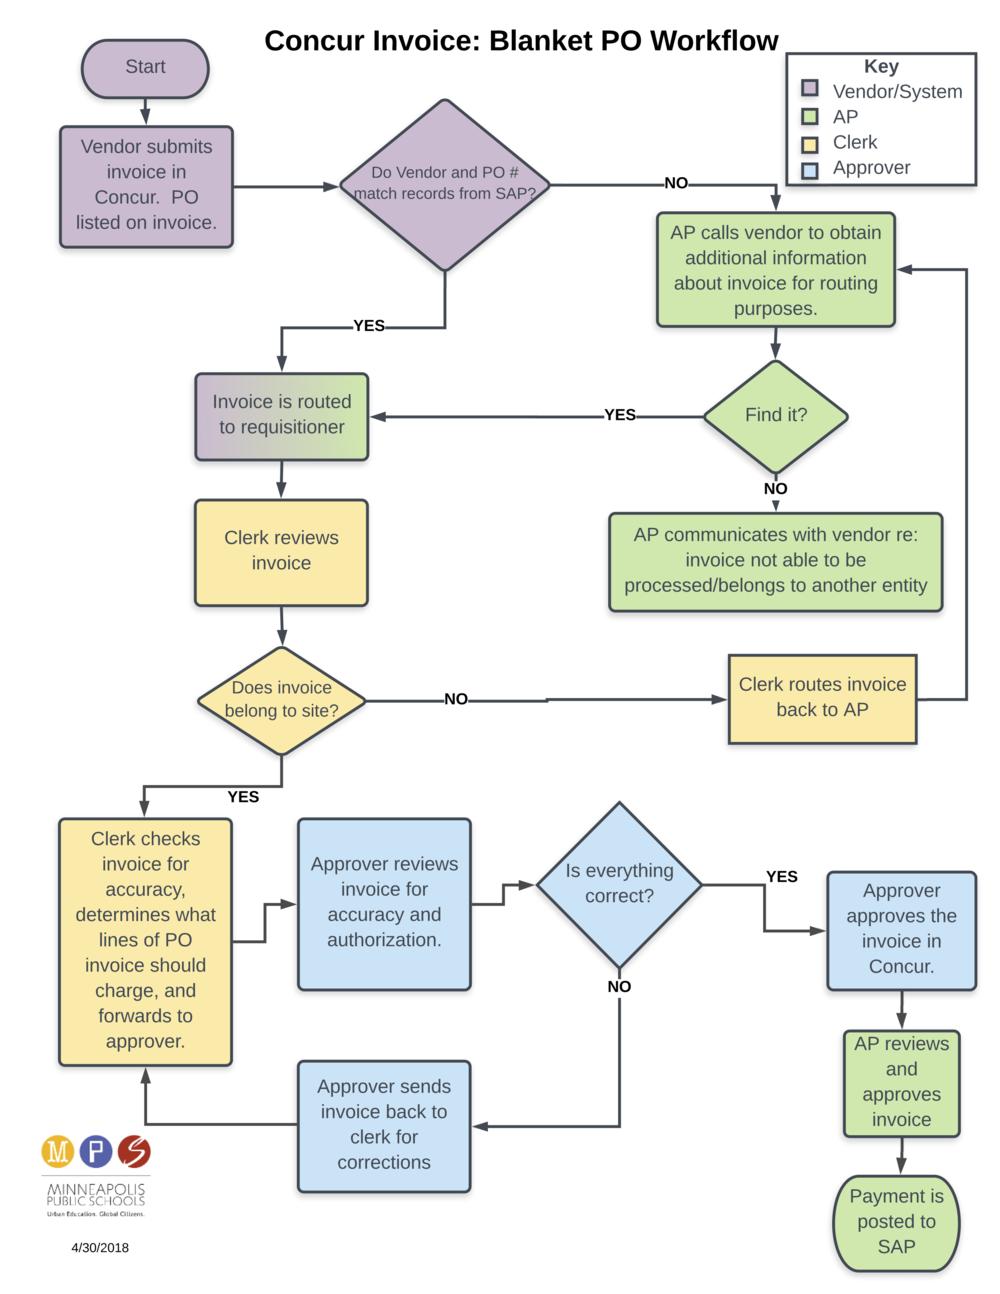 Concur - Workflow – Blanket PO